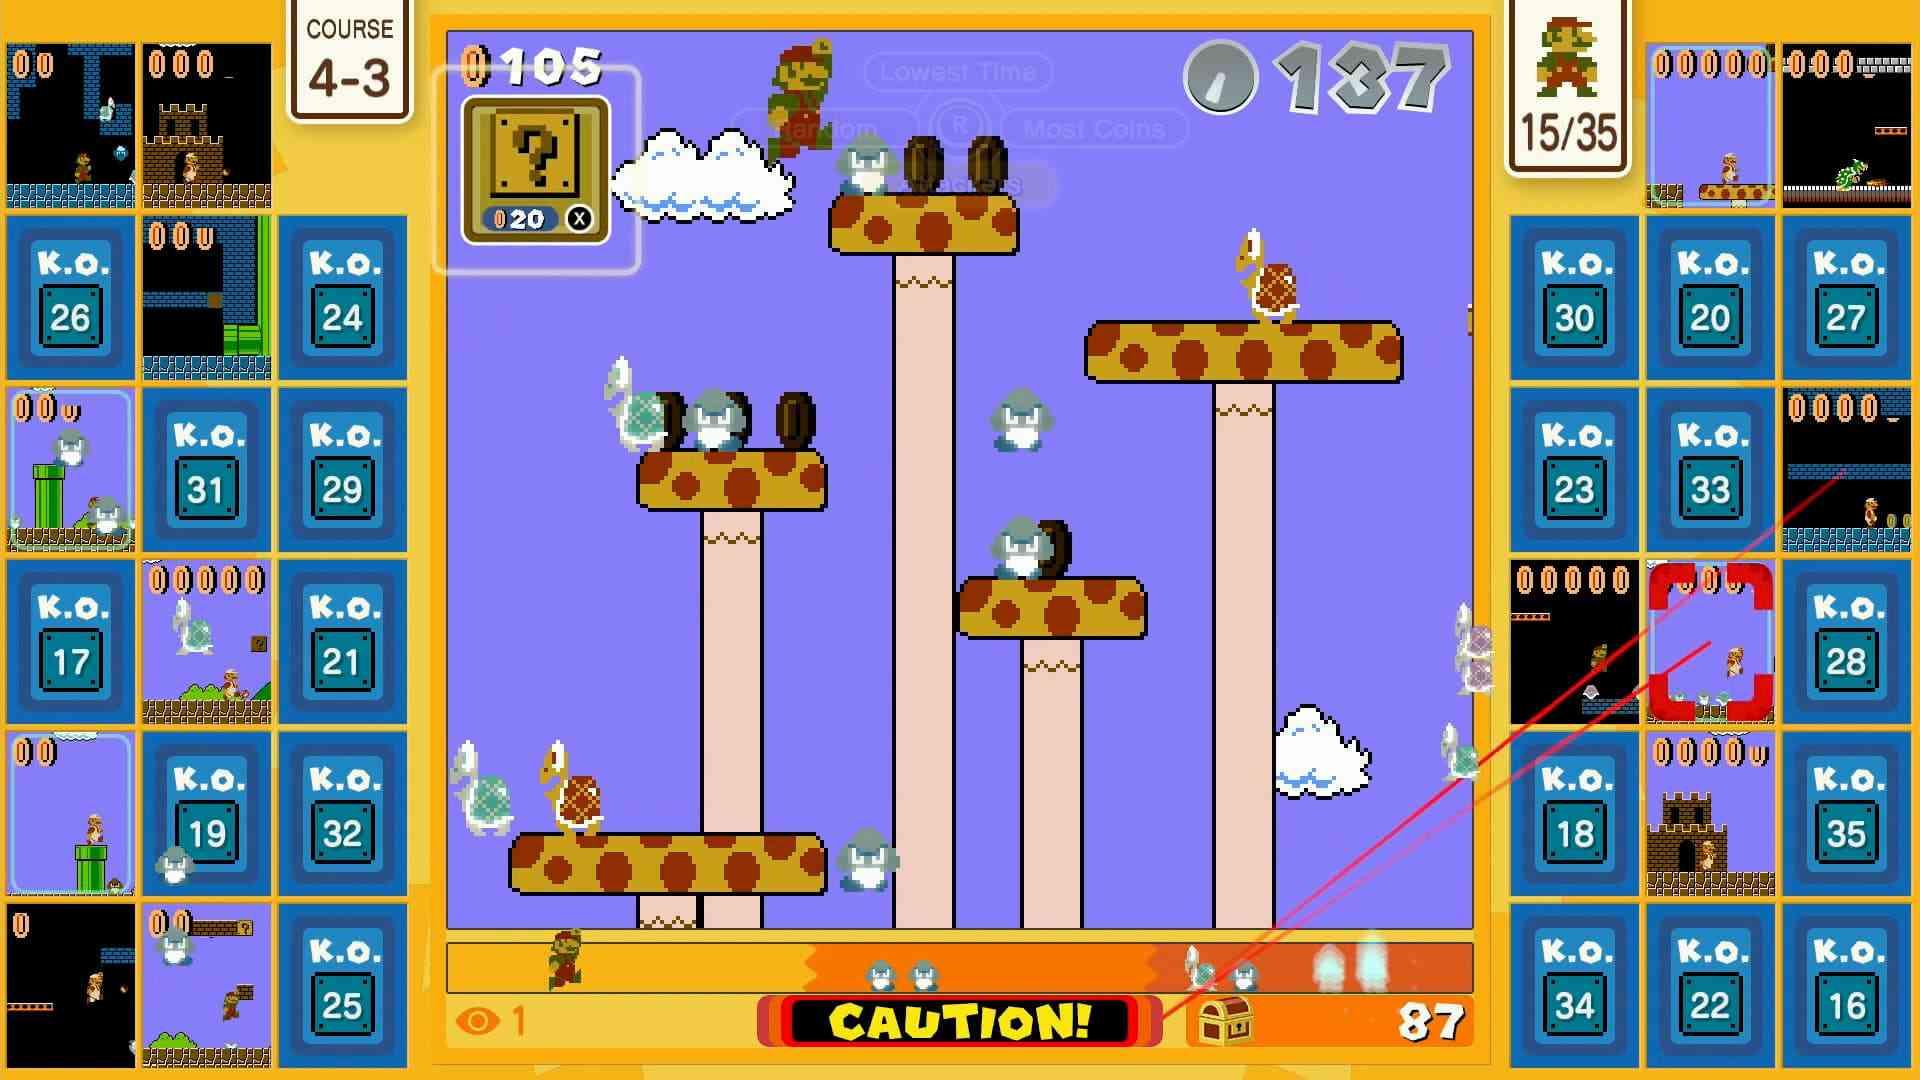 Super Mario Bros. 35 press screenshot